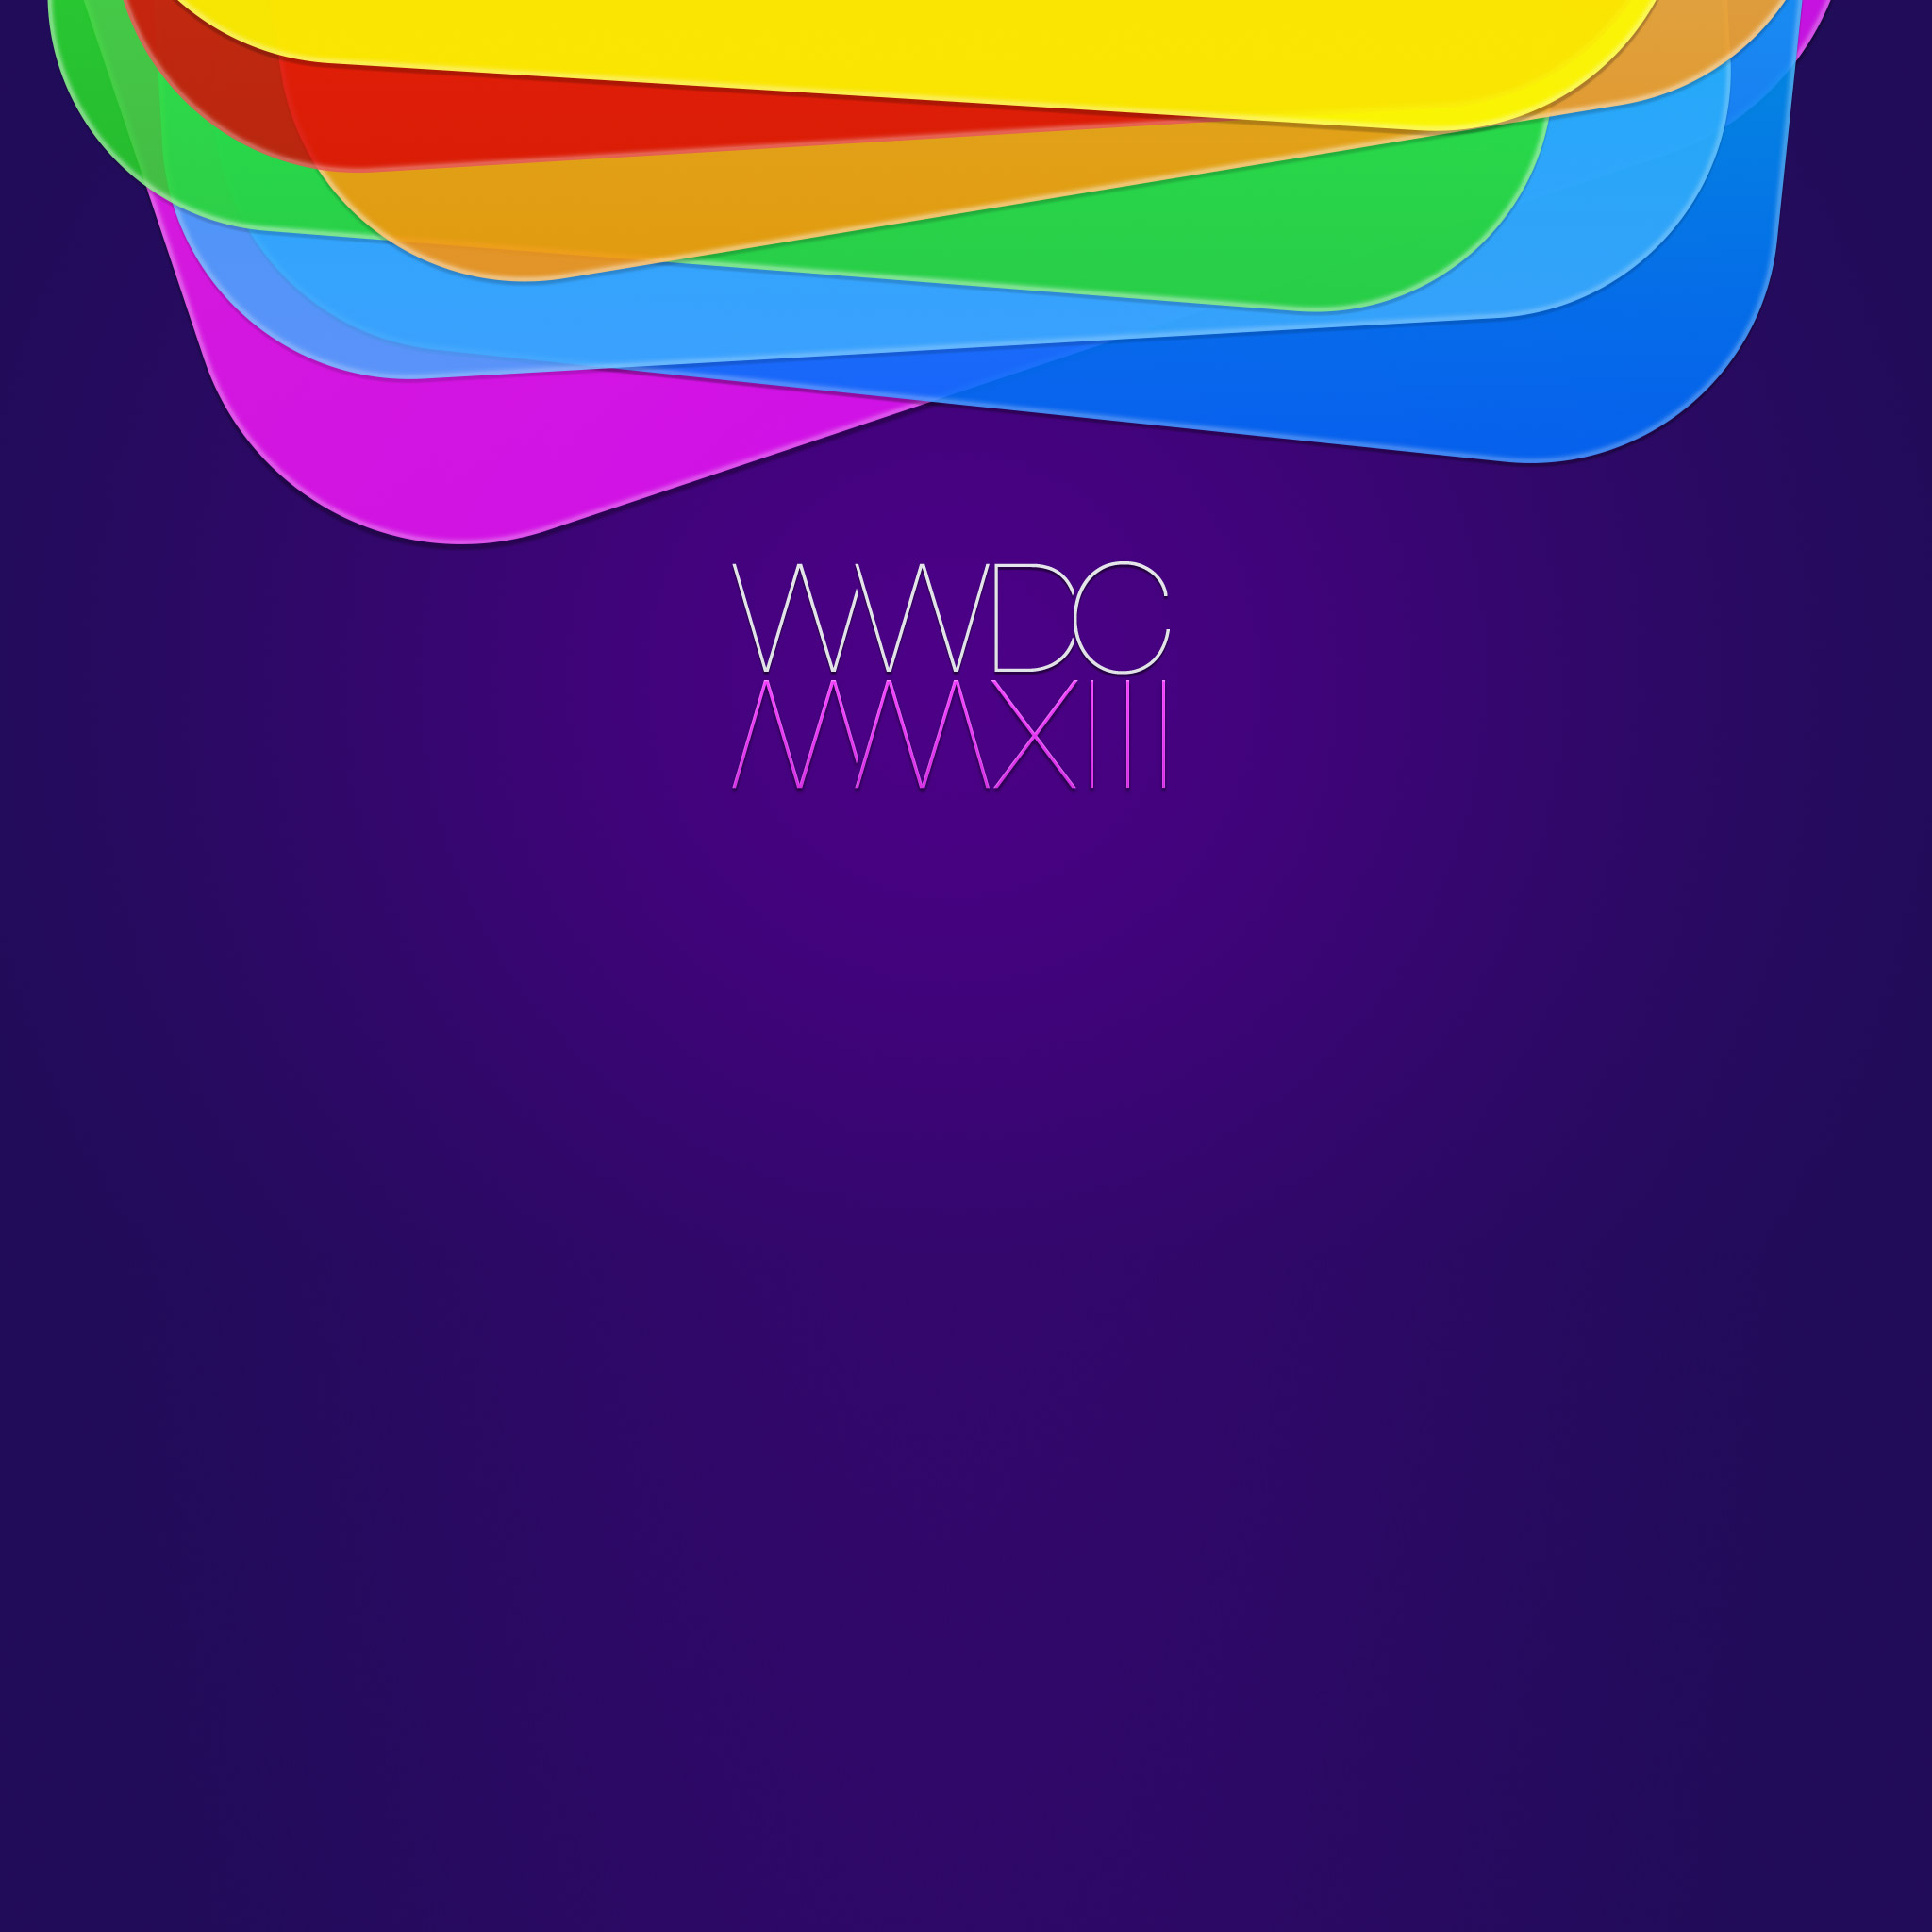 WWDC iPad